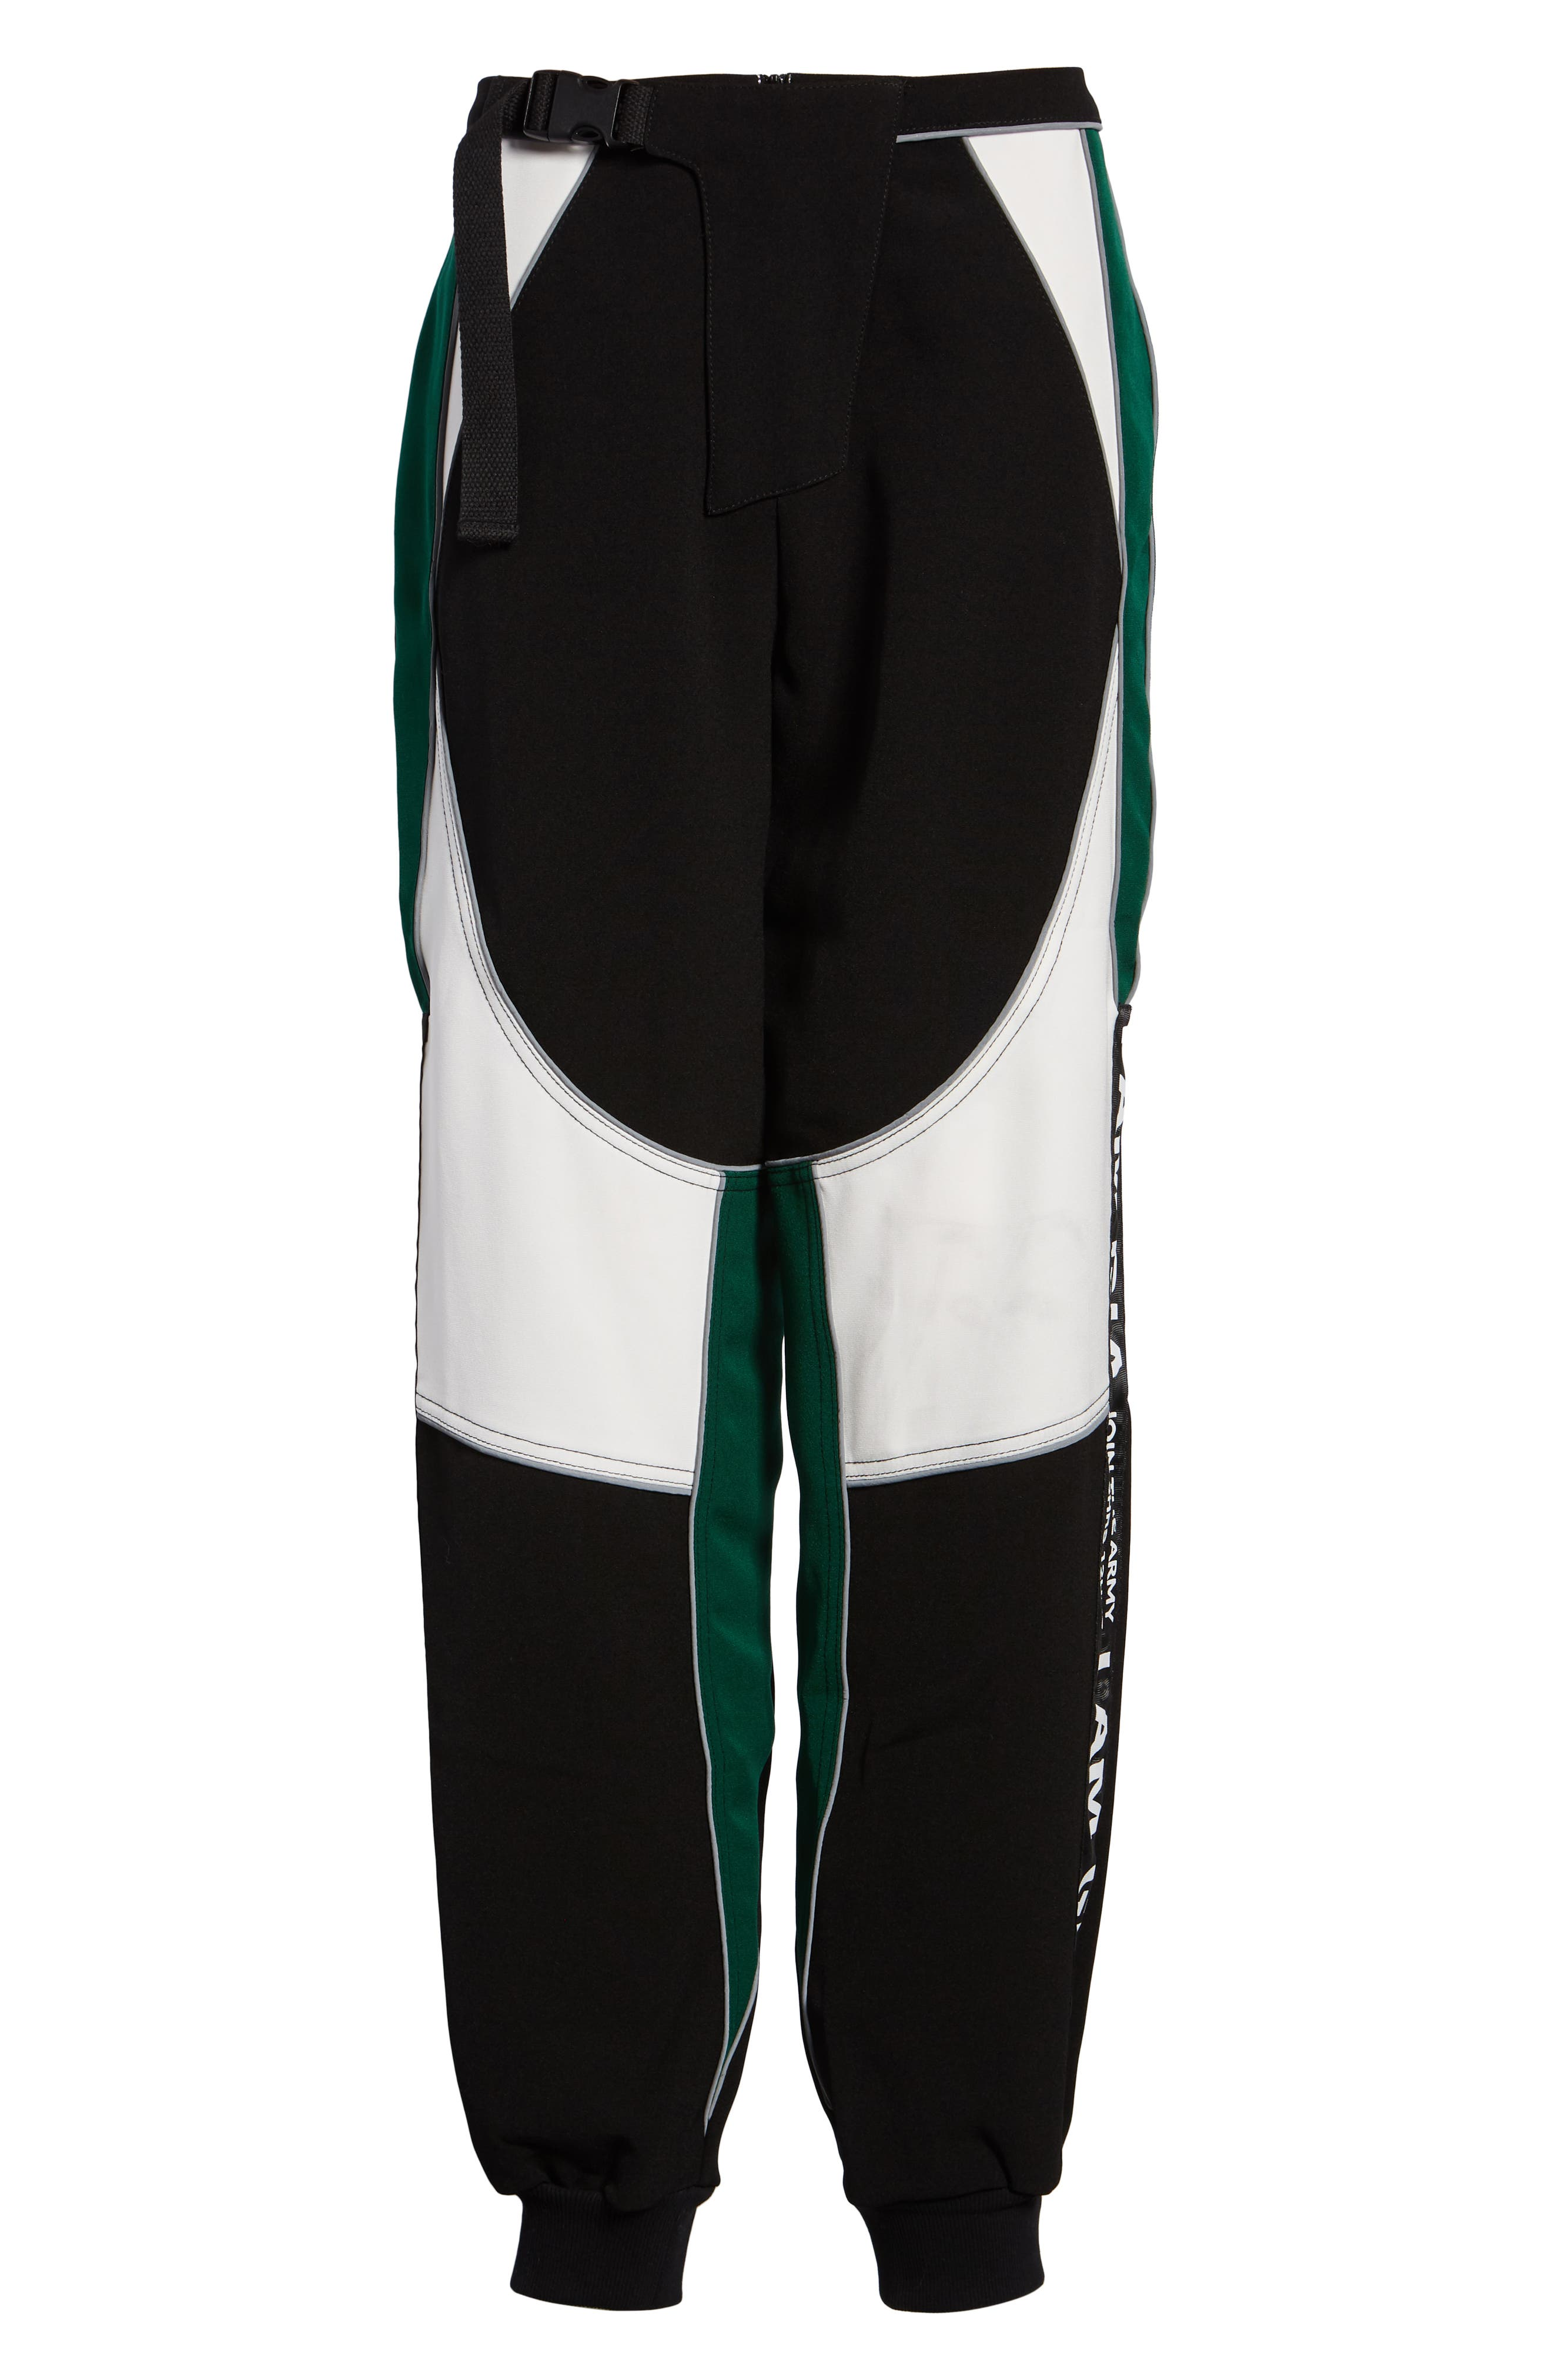 I.AM.GIA Electra Pants,                             Alternate thumbnail 6, color,                             BLACK/ GREEN